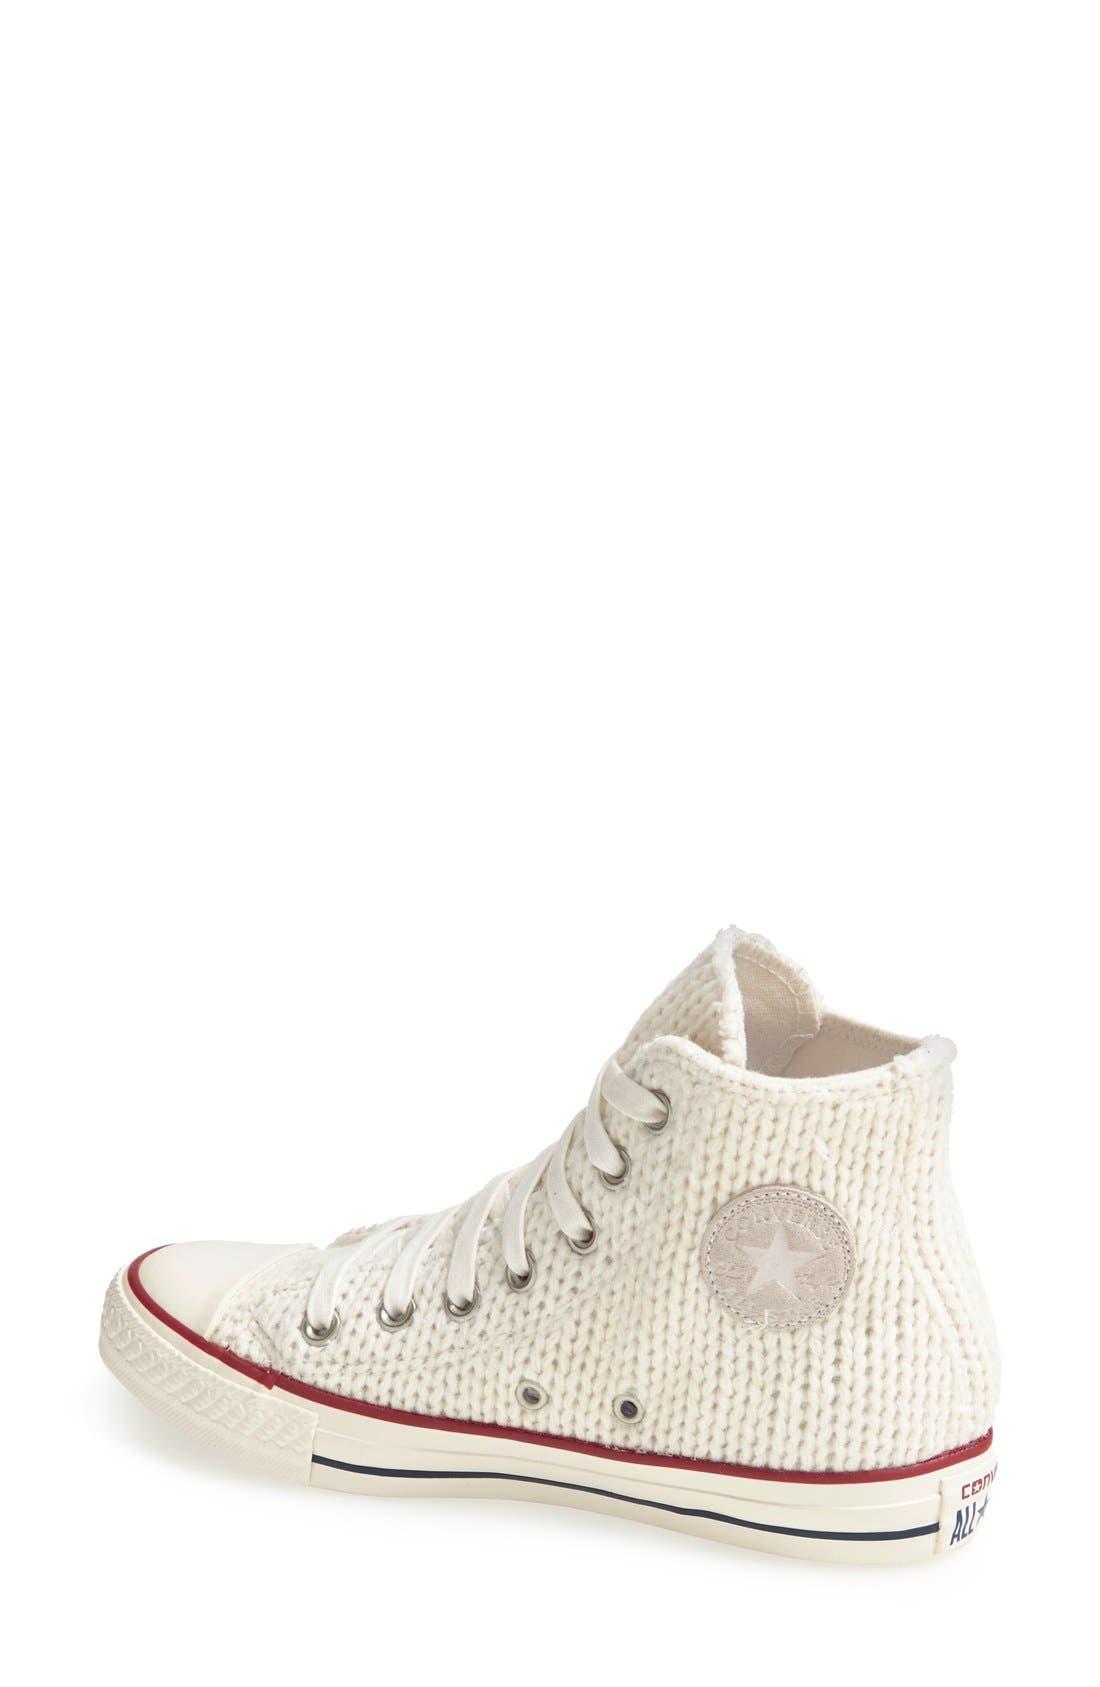 Alternate Image 2  - Converse Chuck Taylor® All Star® 'Winter Knit' High Top Sneaker (Women)